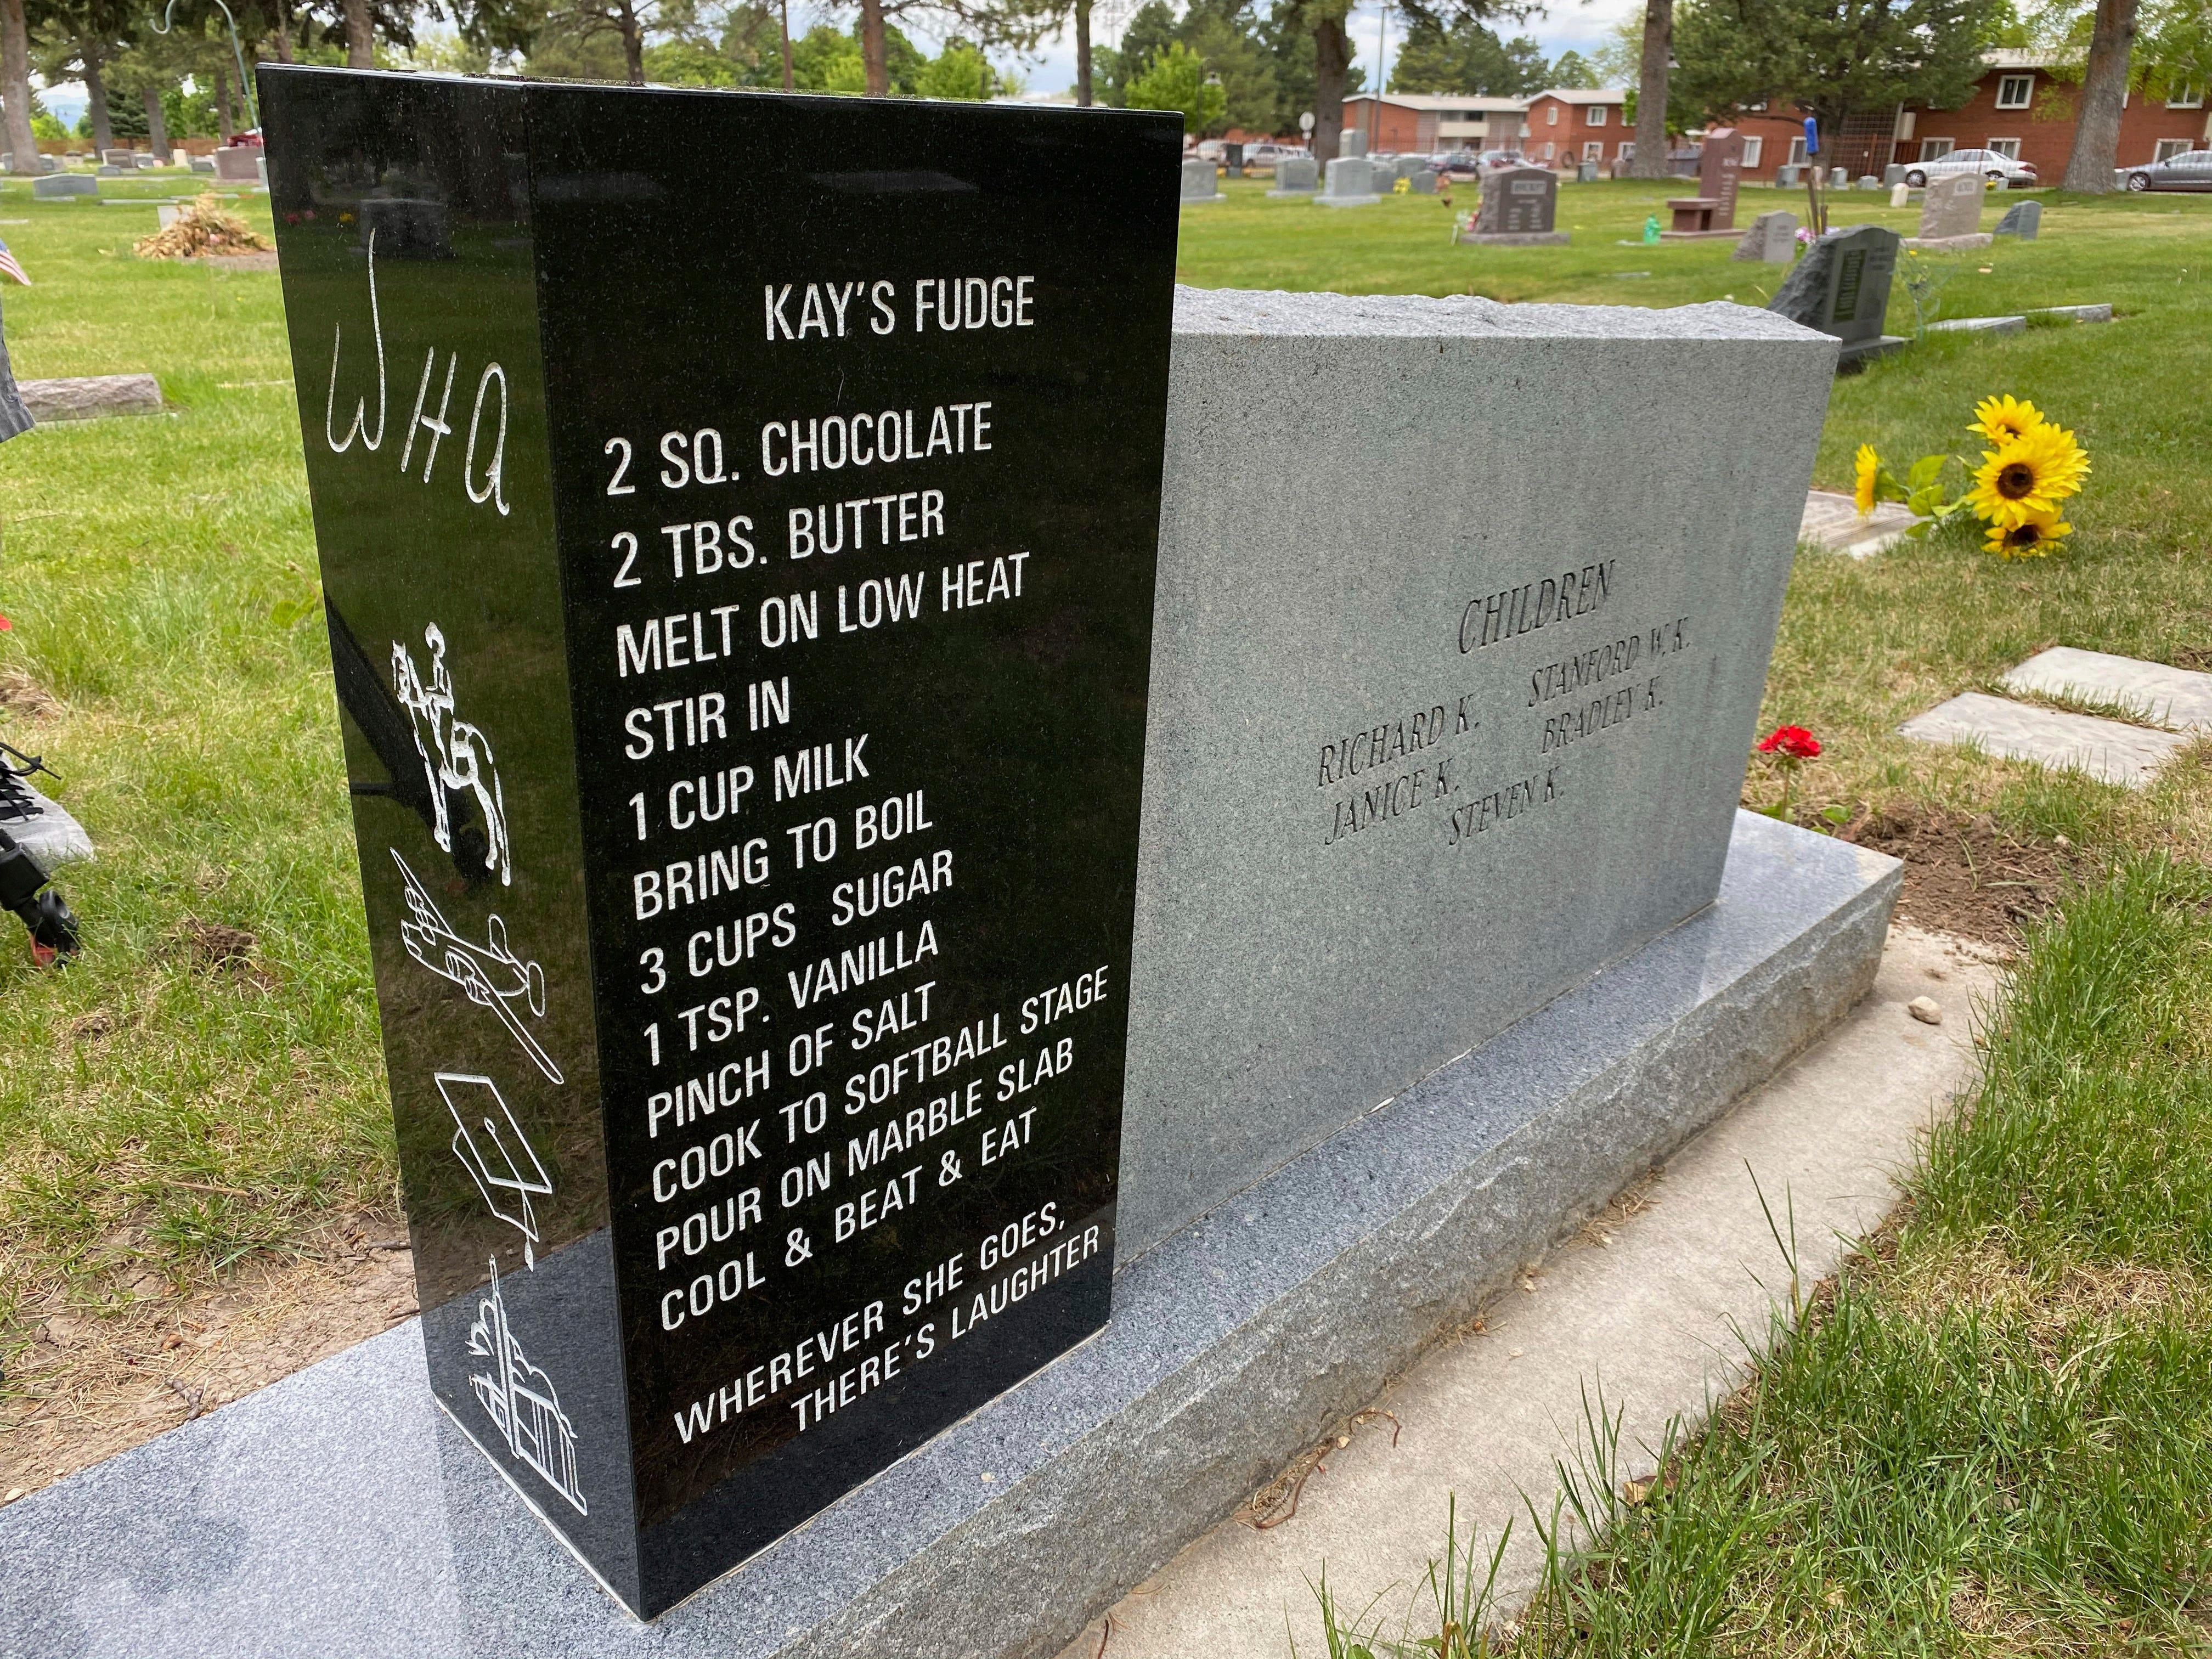 Family shares story behind fudge recipe on Utah headstone 2